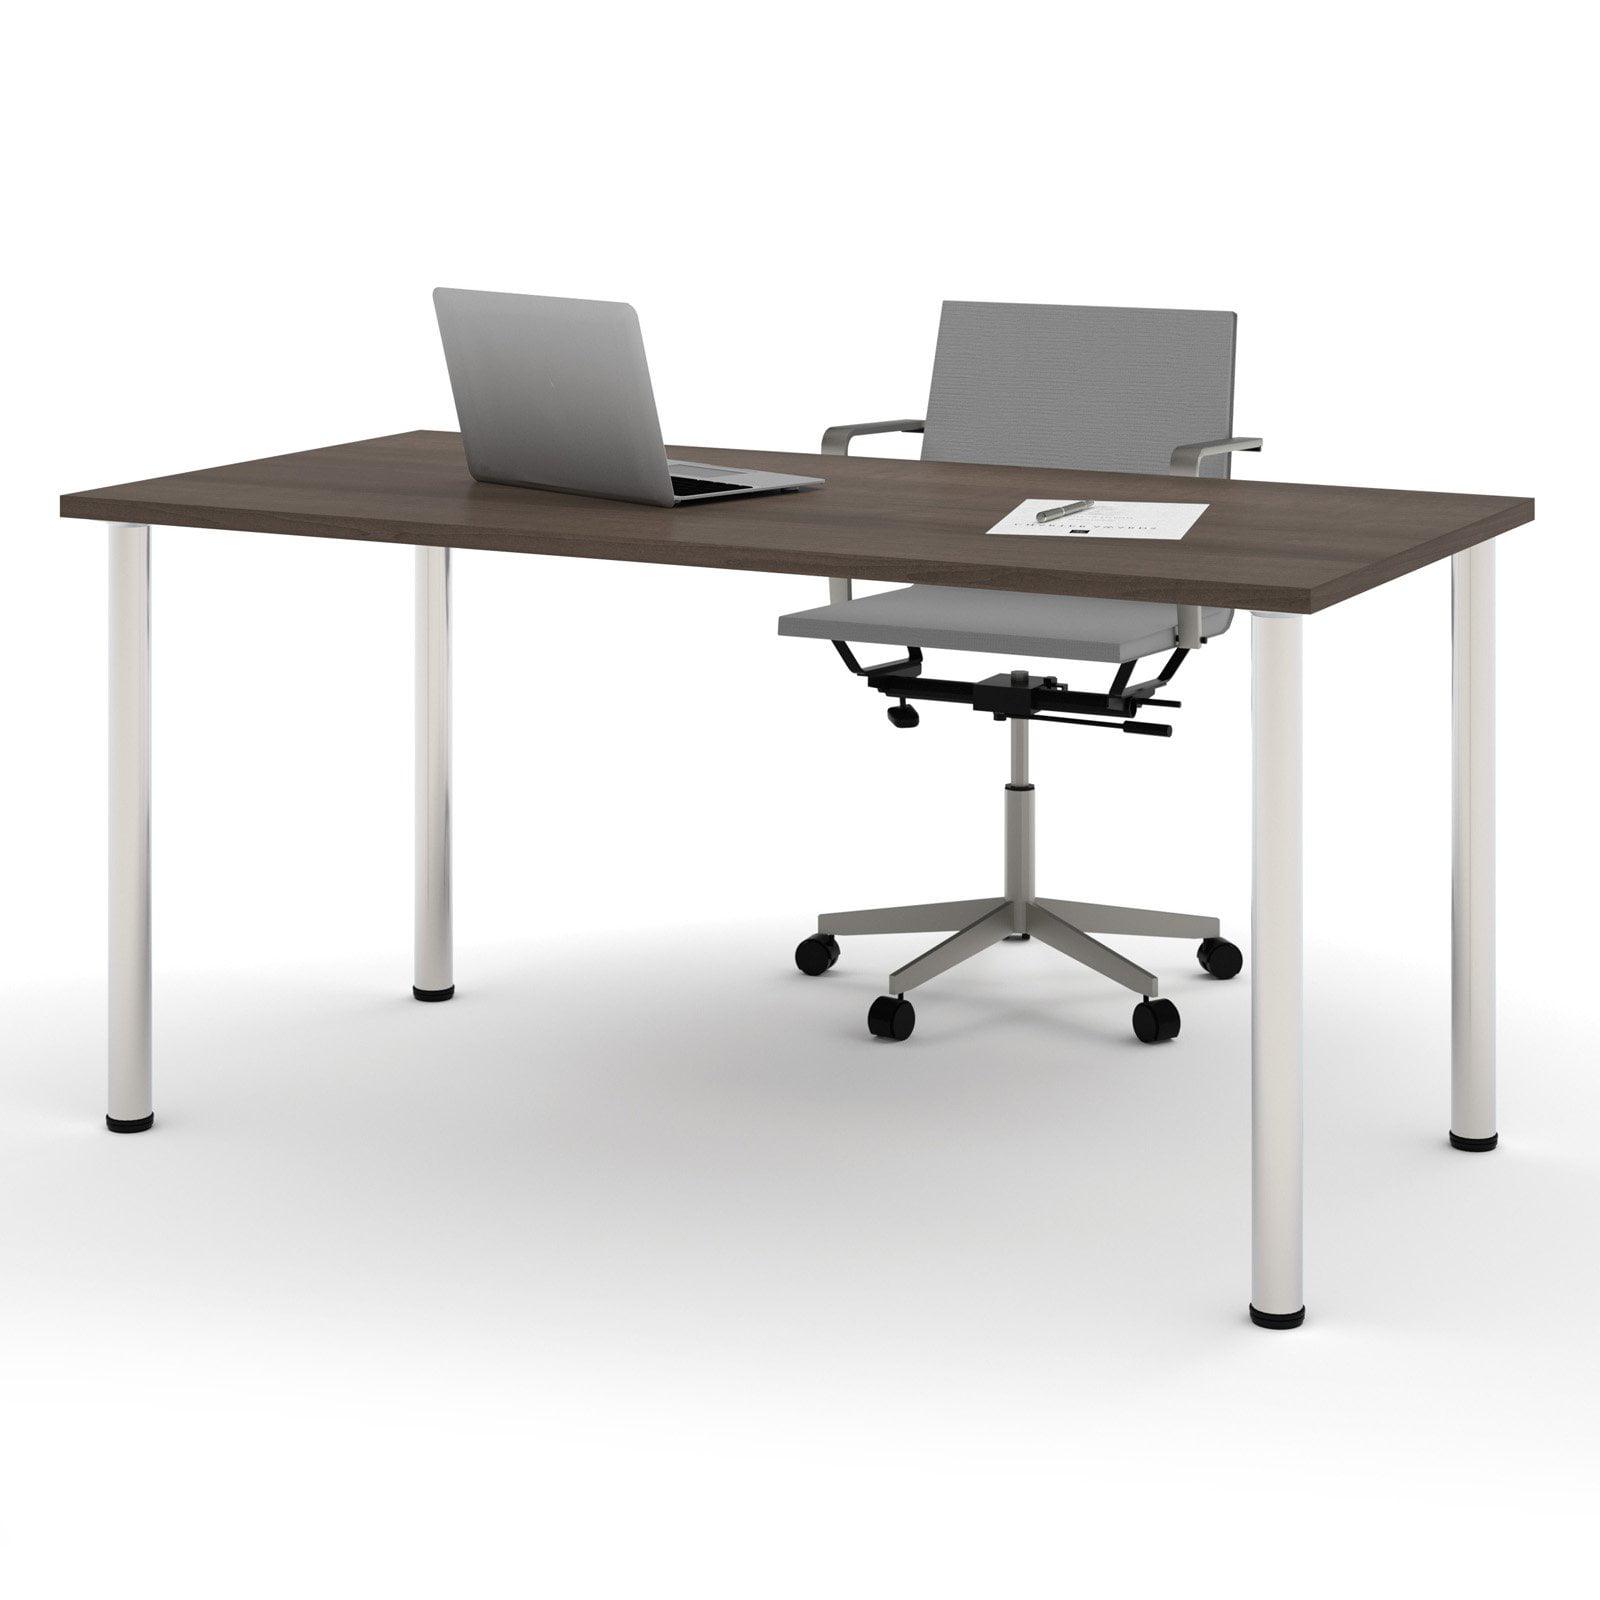 "Bestar 30"" x 60"" Table with round metal legs in Antigua by Bestar"